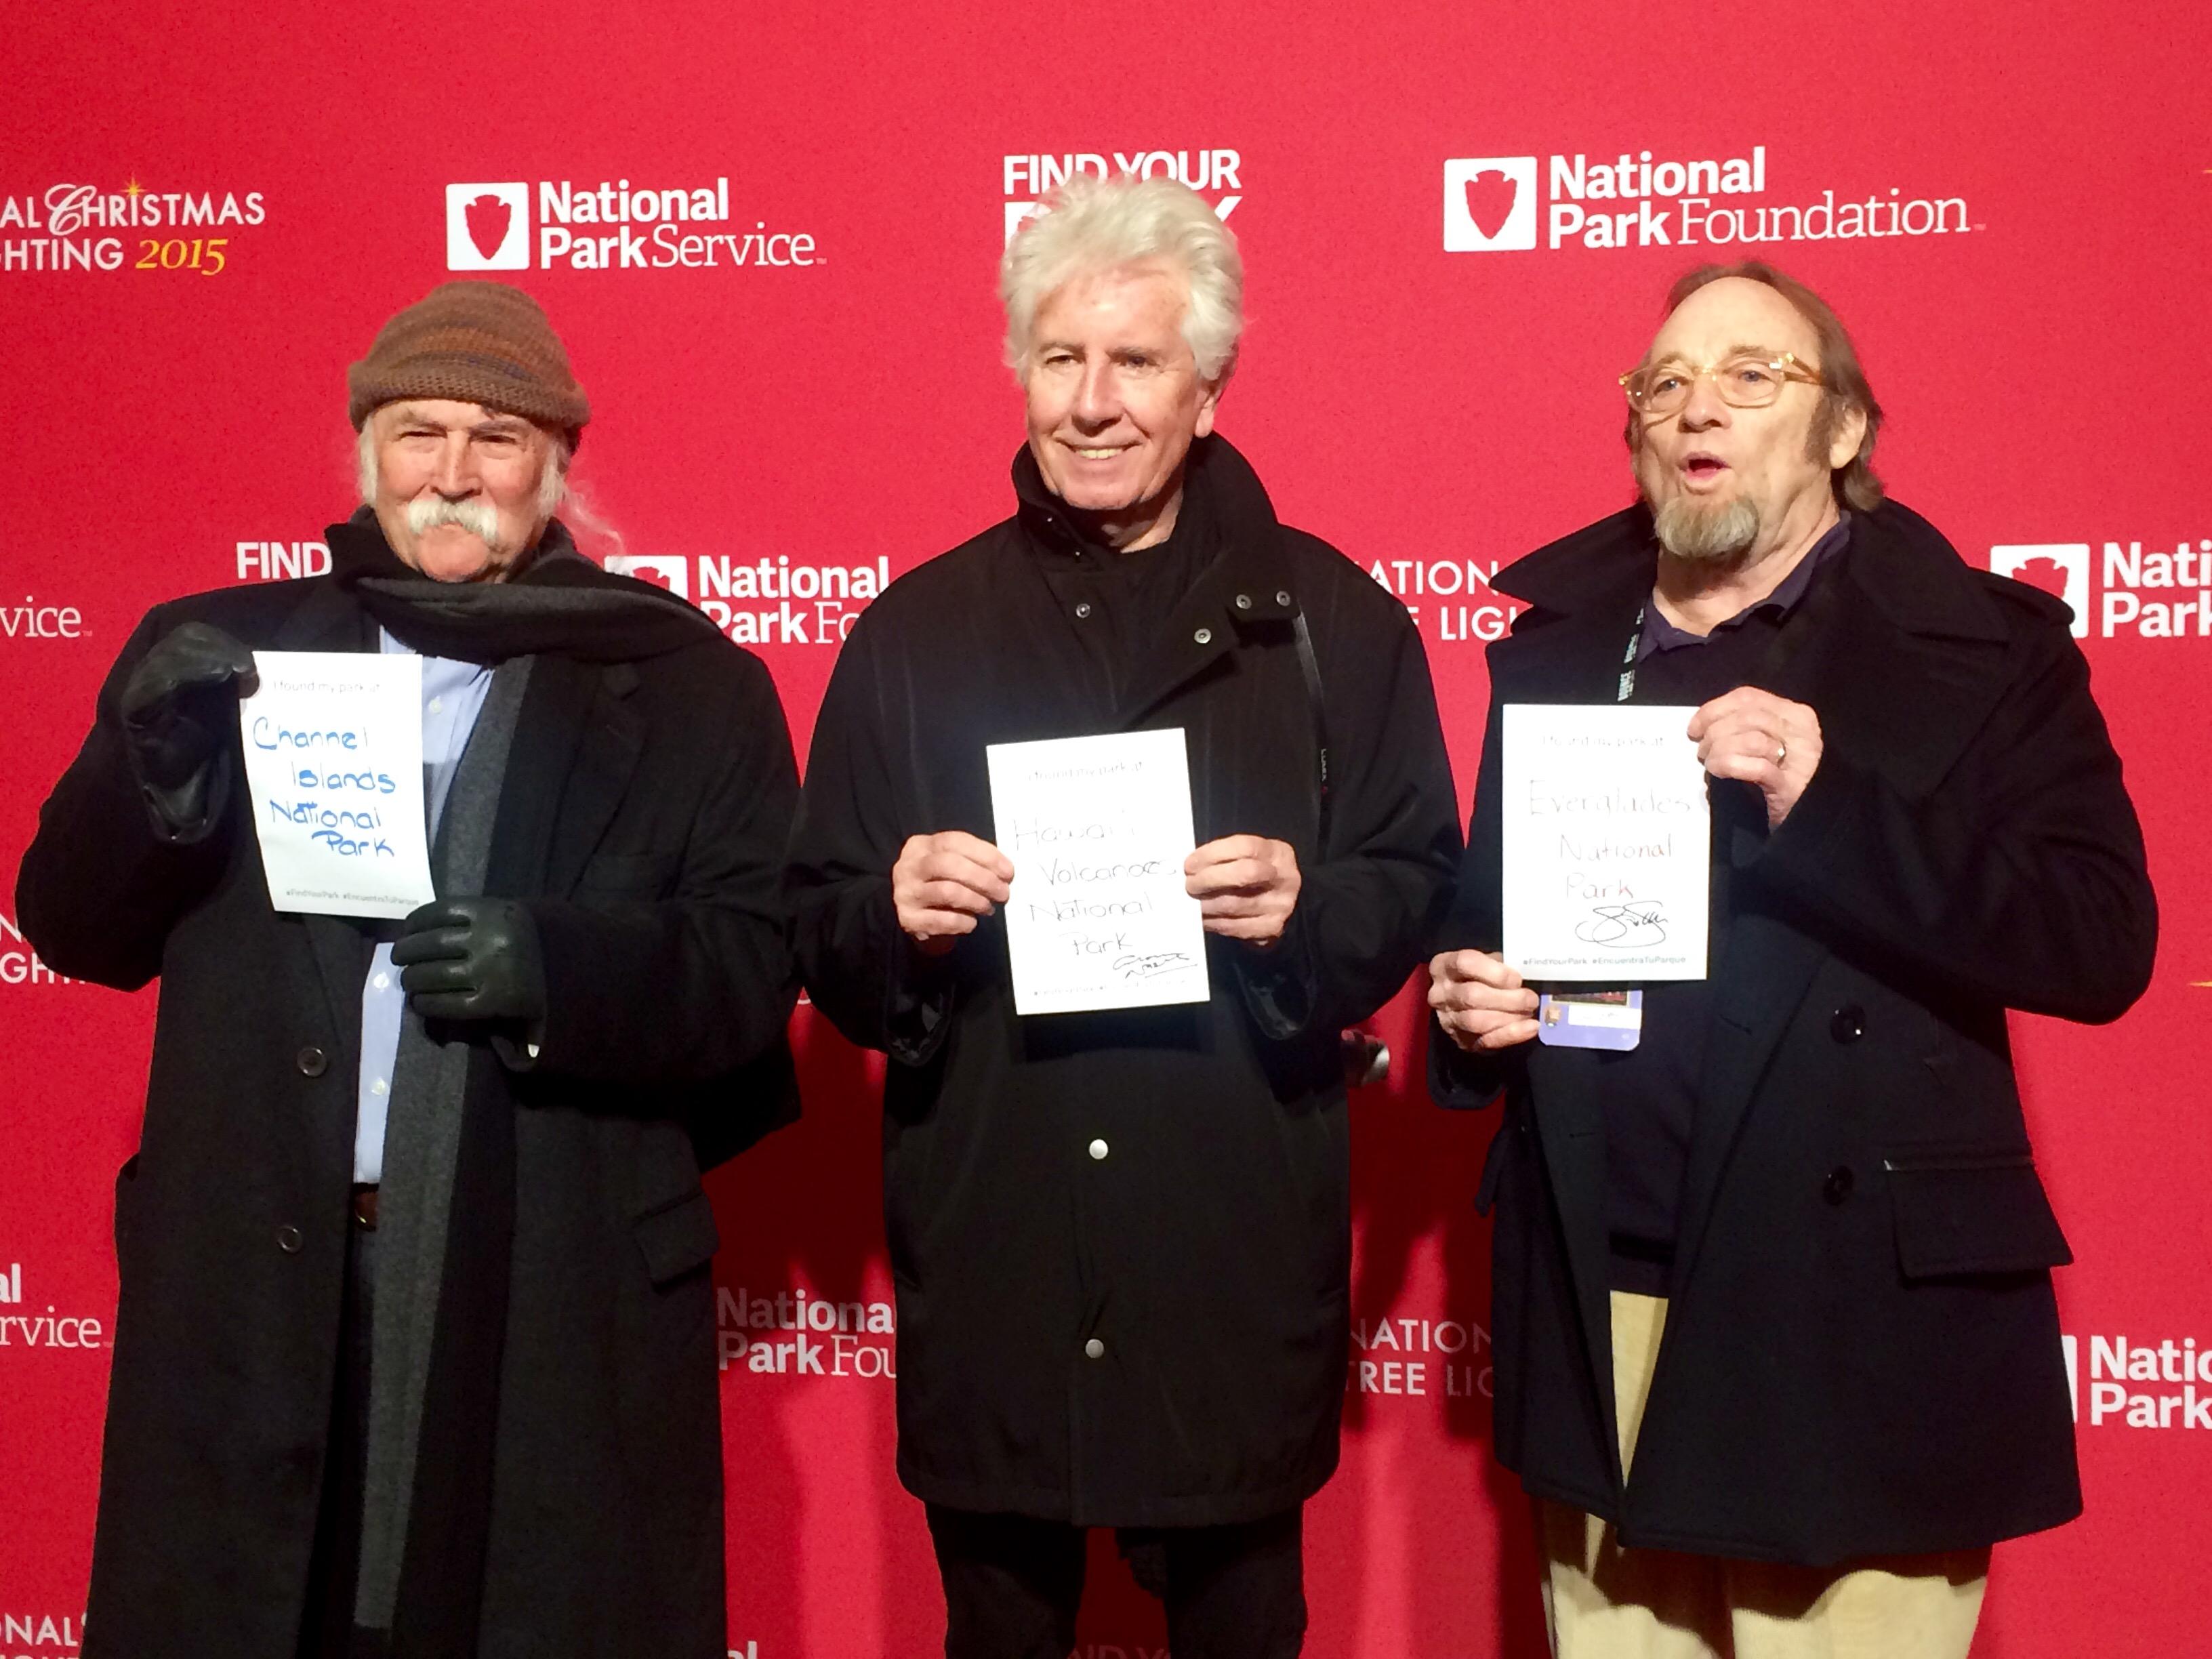 Crosby, Stills & Nash seek 'peace on earth' at tree lighting